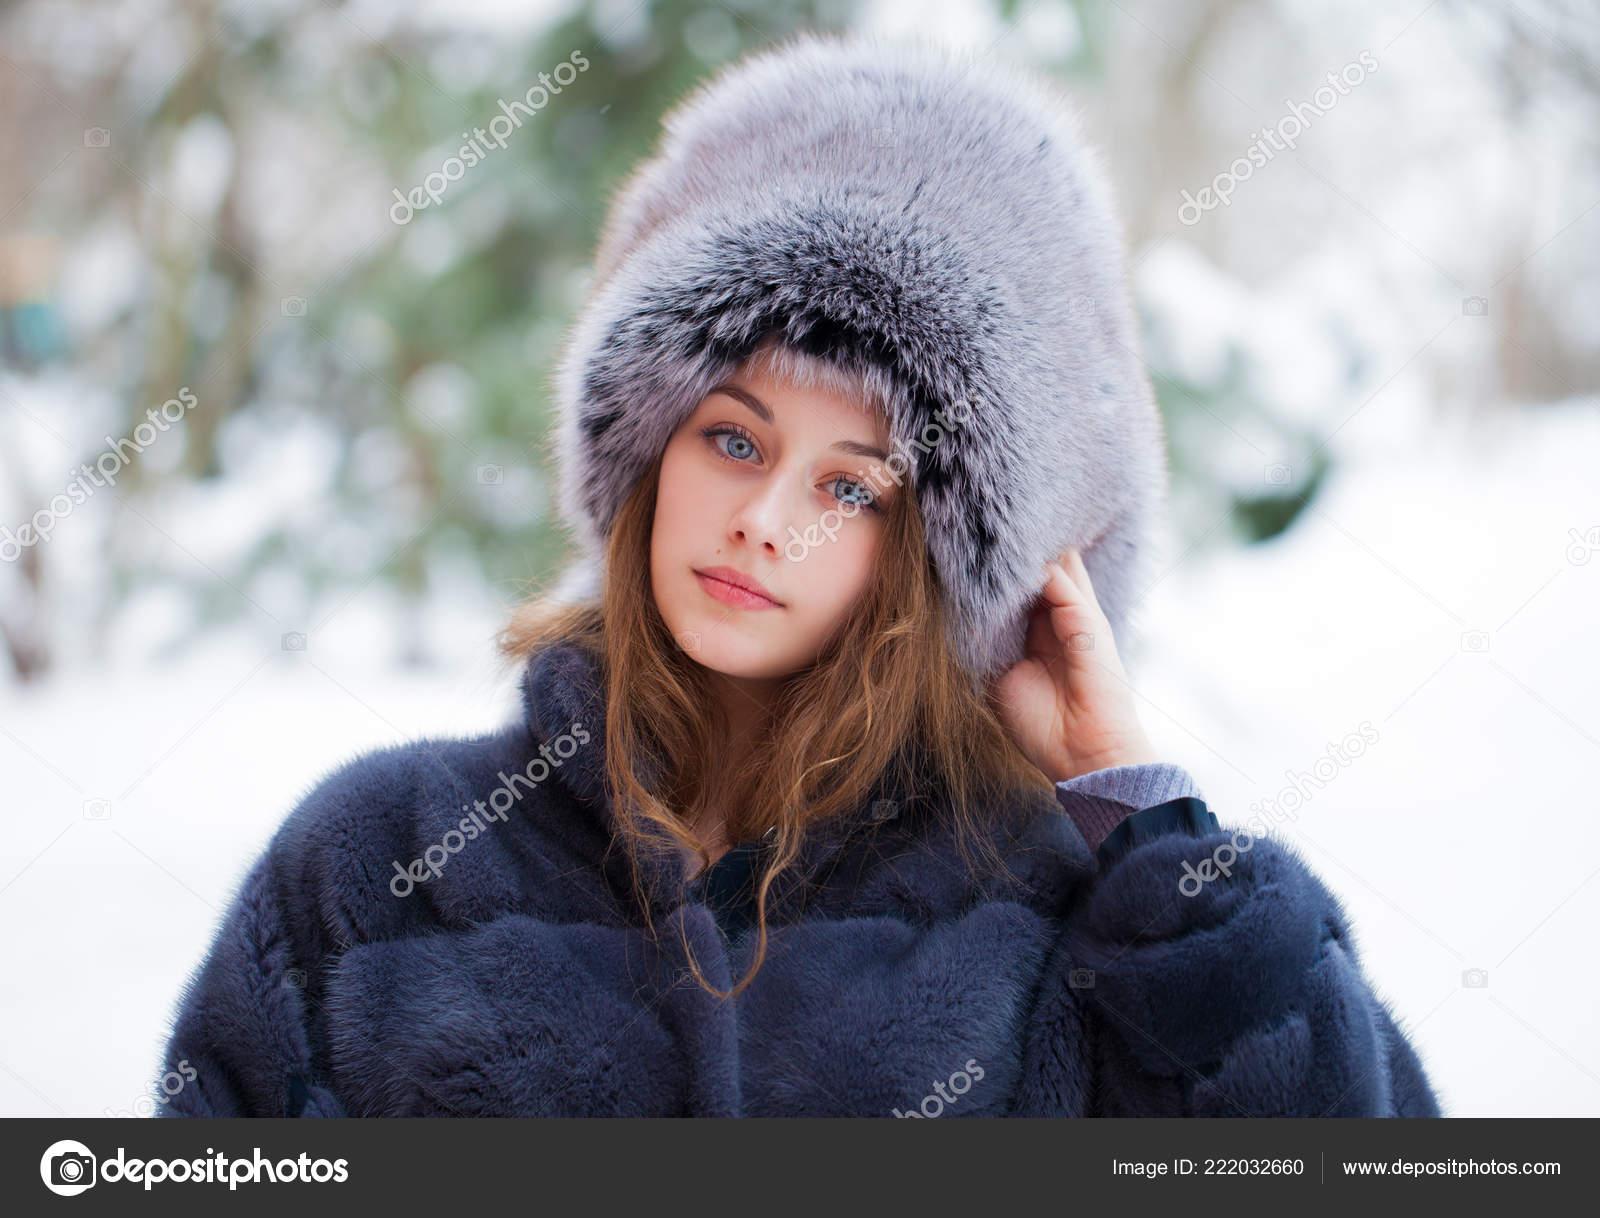 Beautiful Young Girl Blue Fur Hat Fur Coat Portrait Fashion